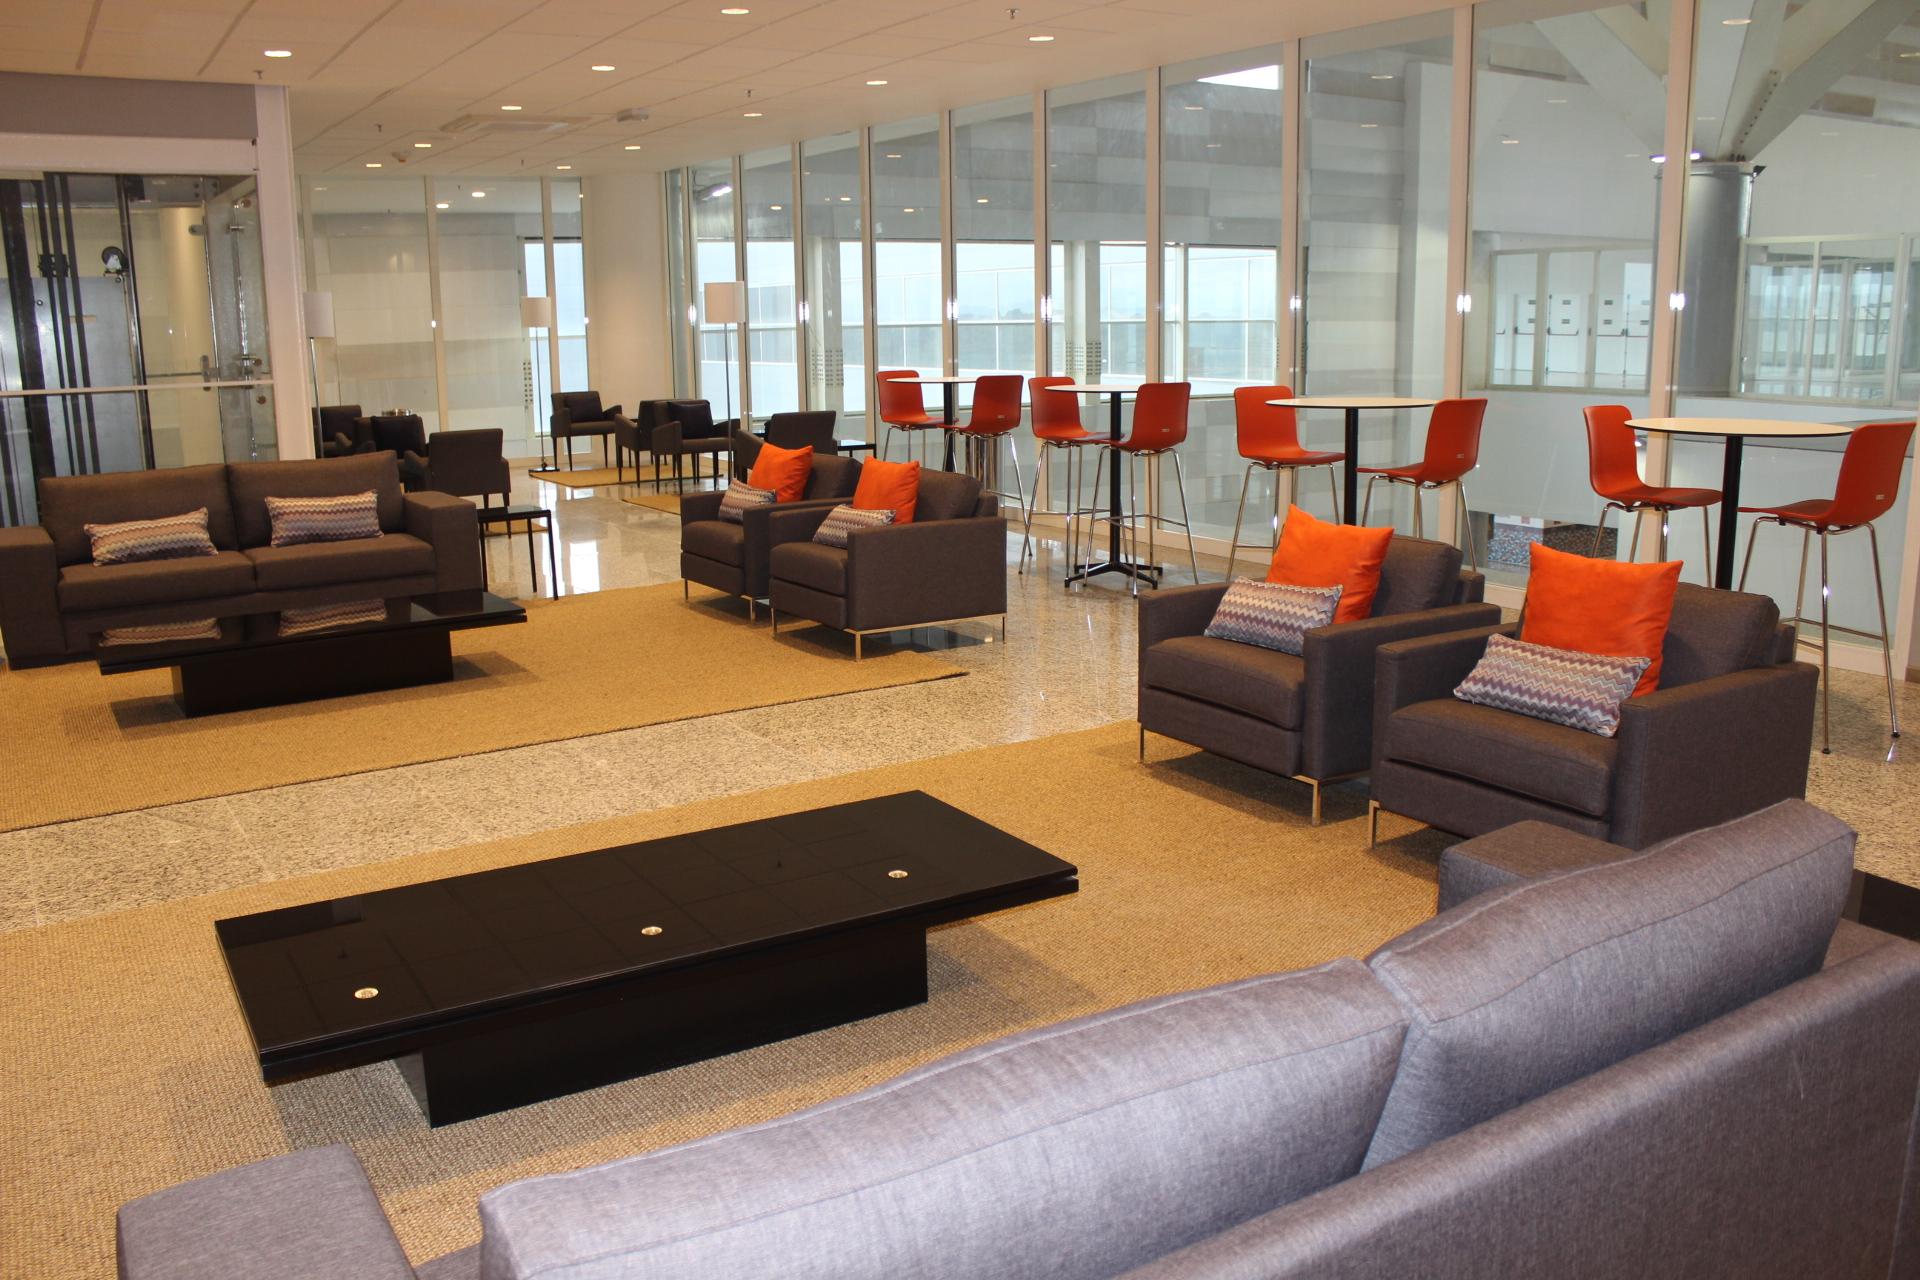 viracopos ganha sala vip no embarque internacional acesso. Black Bedroom Furniture Sets. Home Design Ideas